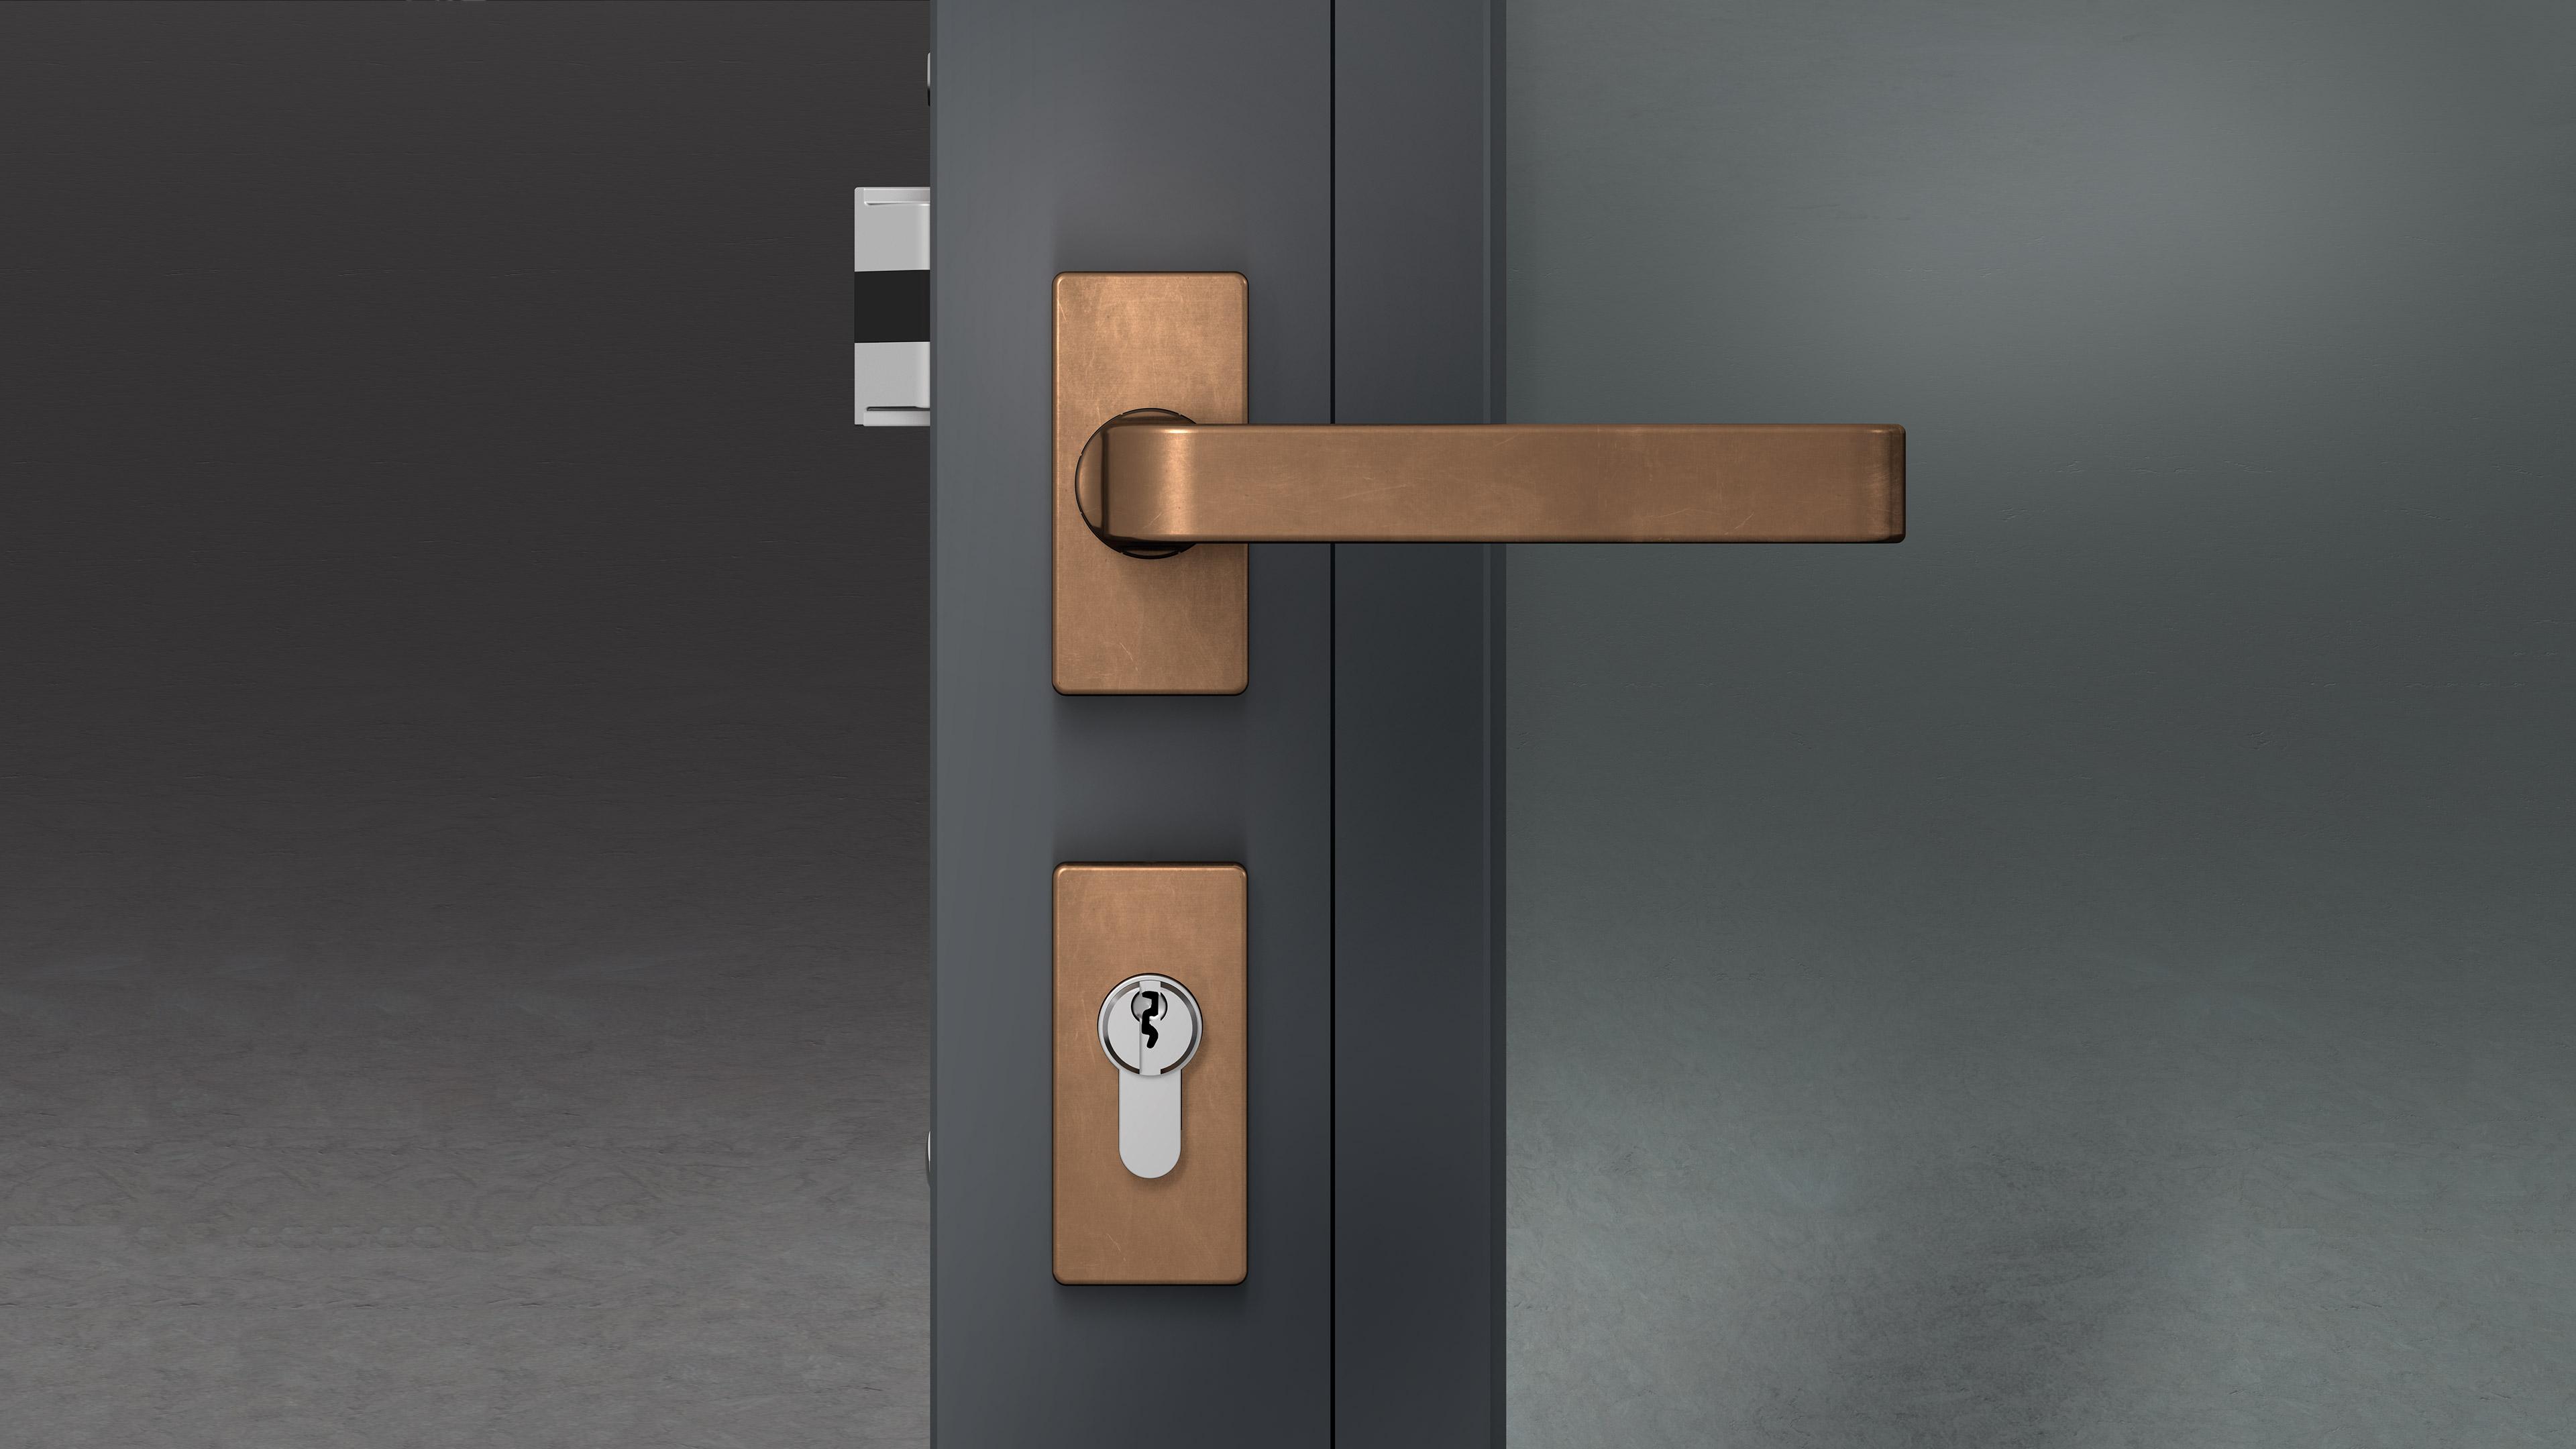 Charmant Narrow Stile Door Hardware